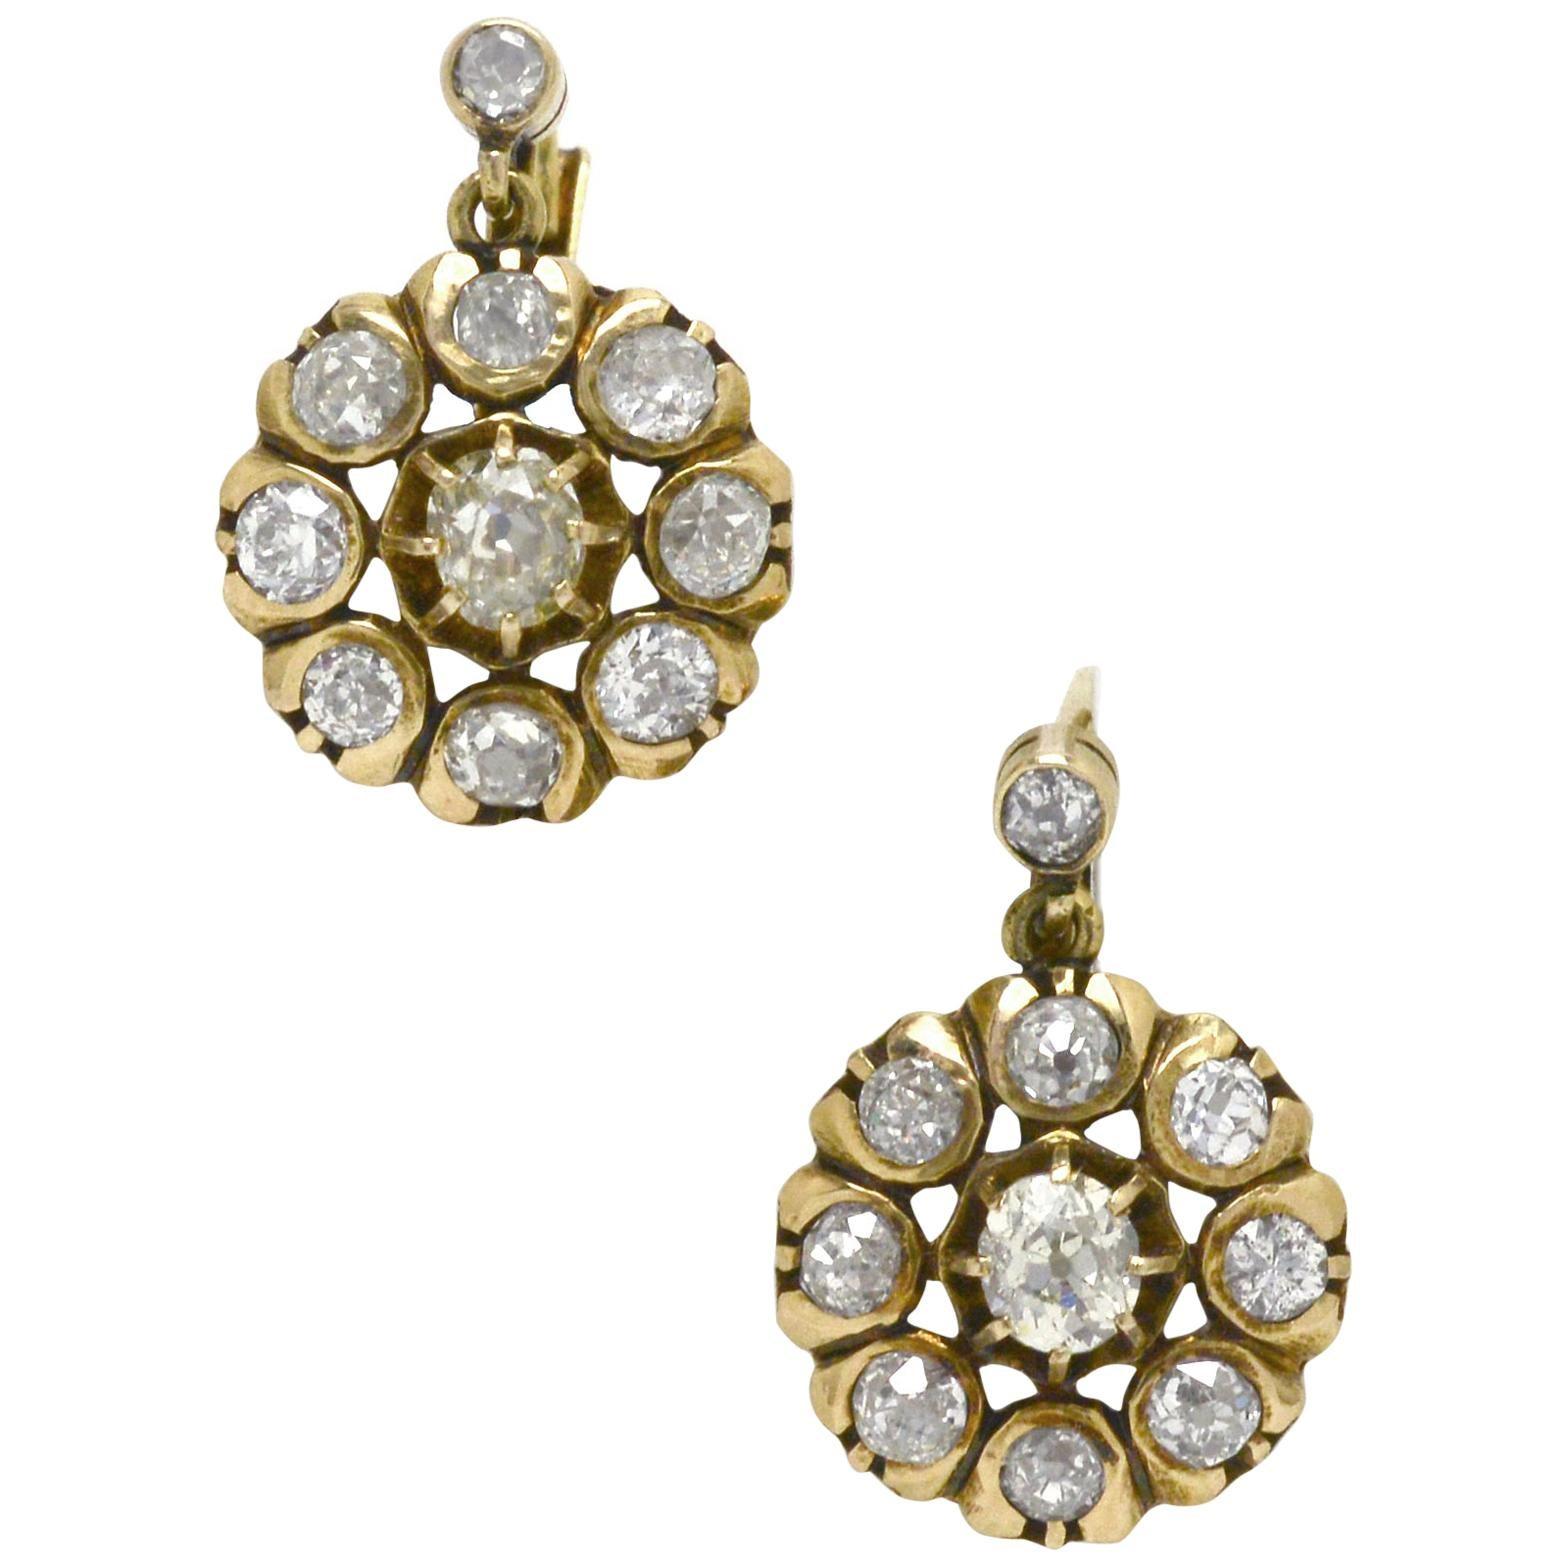 Victorian Diamond Cluster Drop Earrings 18 Karat Yellow Gold Dangle Old Mine Cut